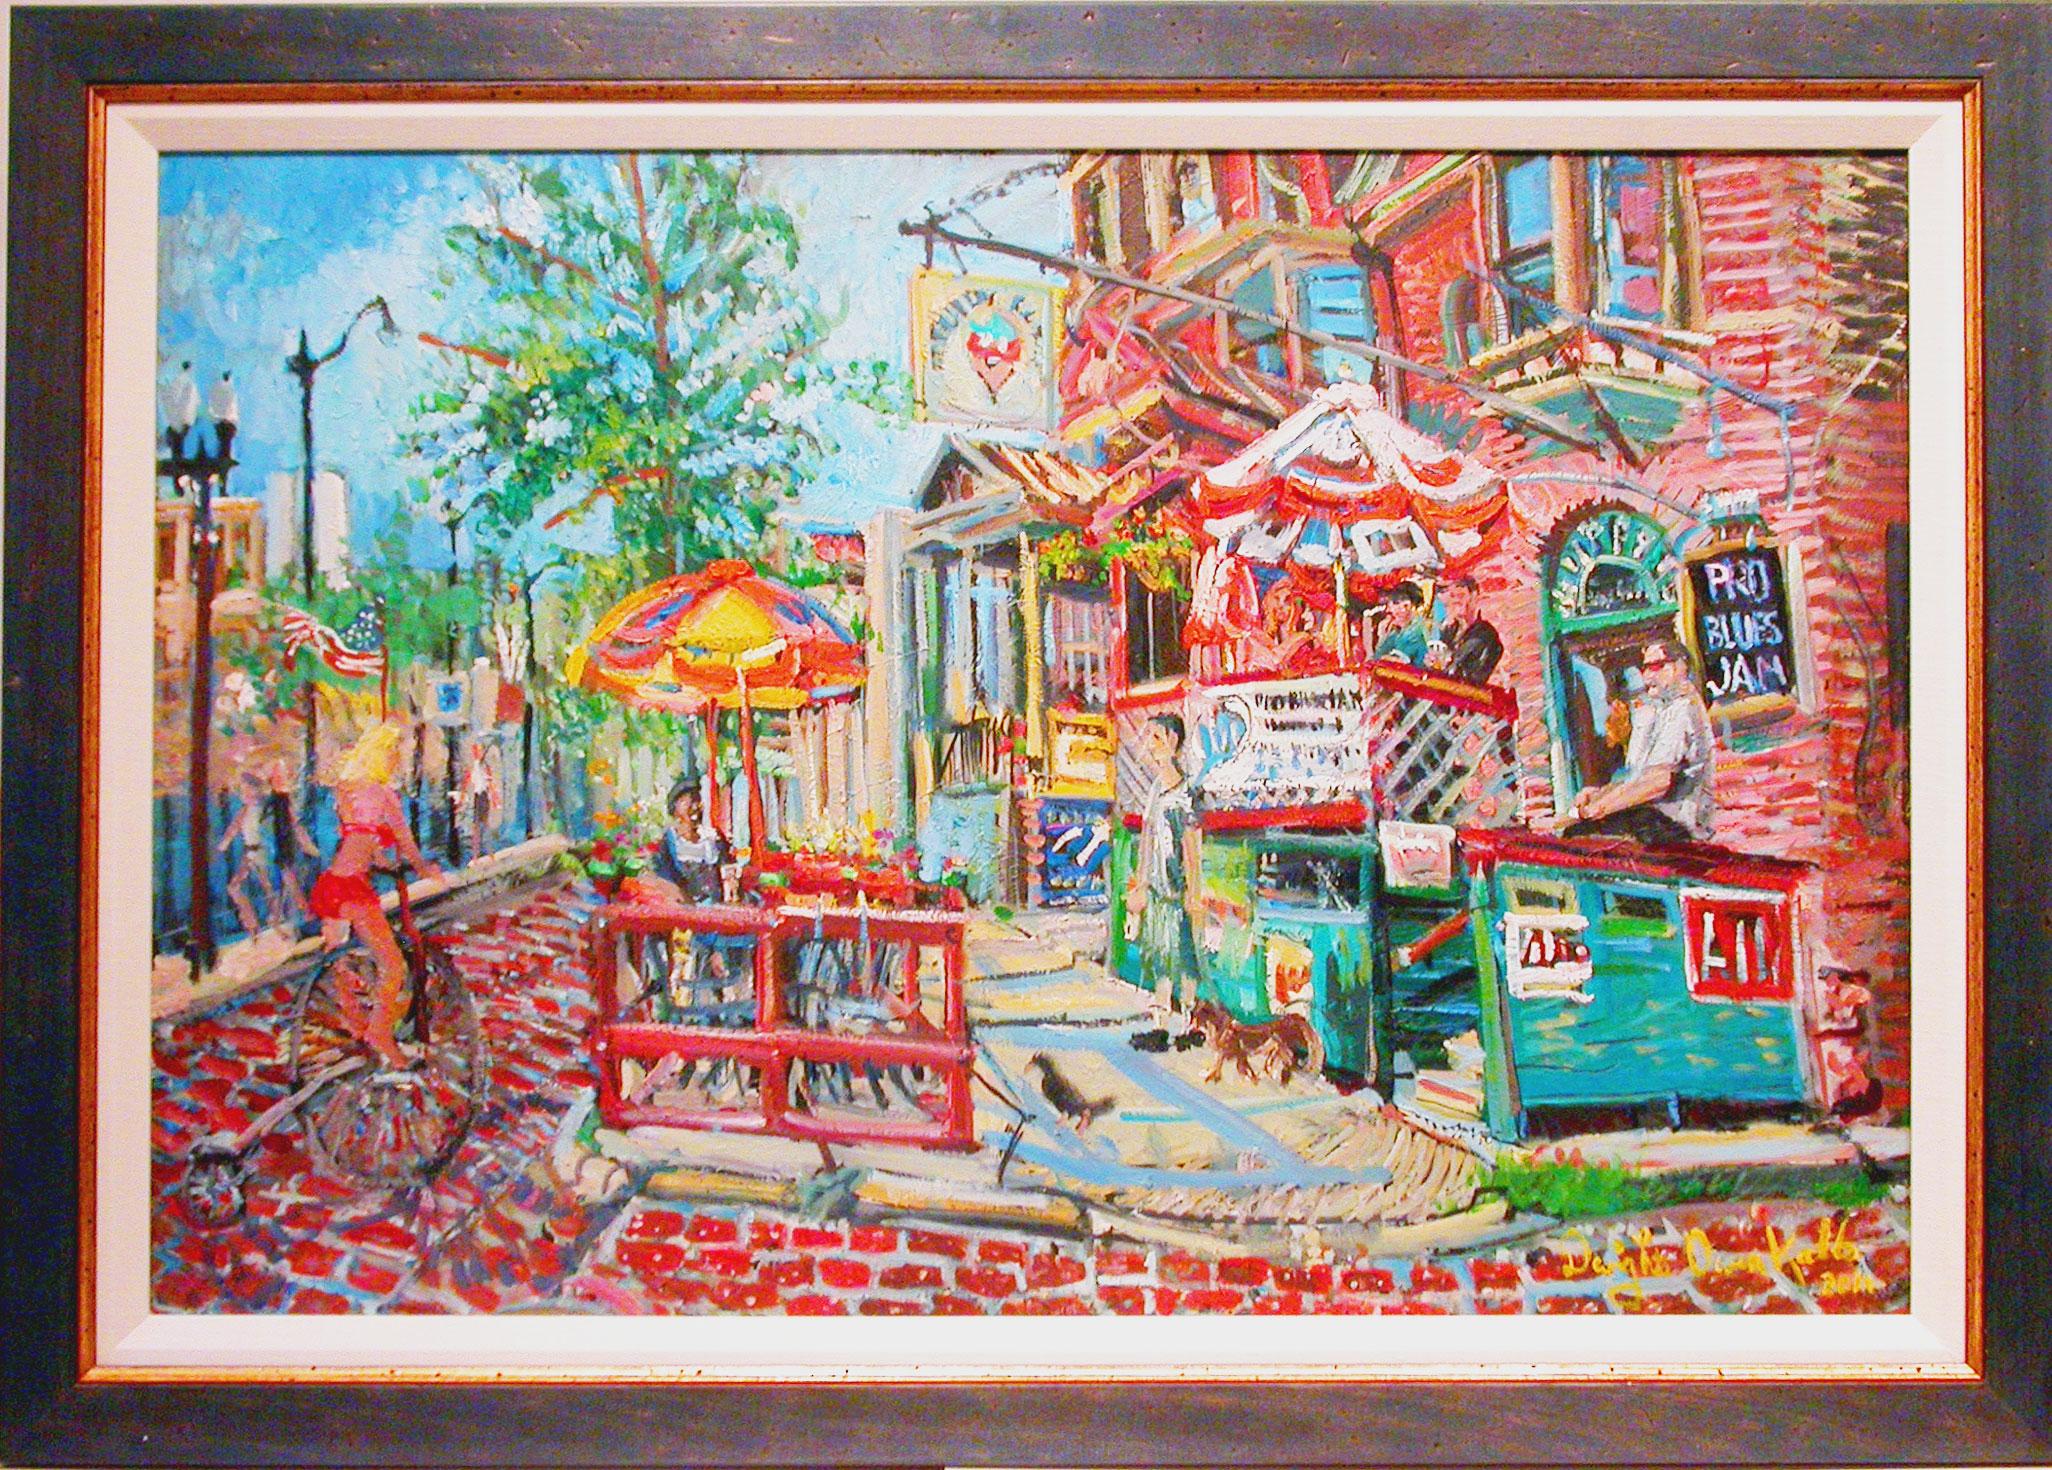 Kalb-Street-Scene-Moulding-with-liner-9820.jpg